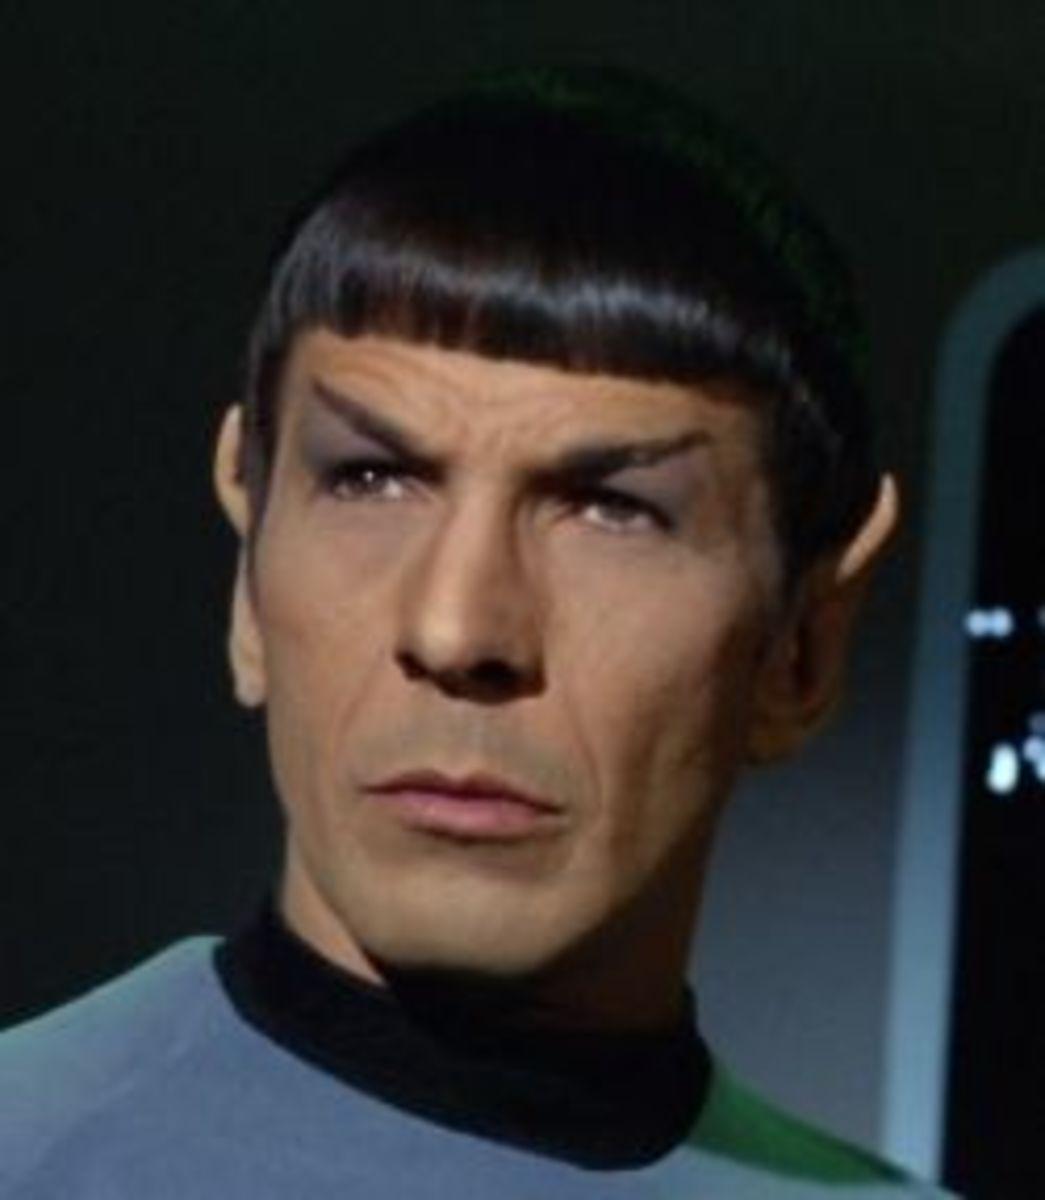 Intelligent Mr. Spock